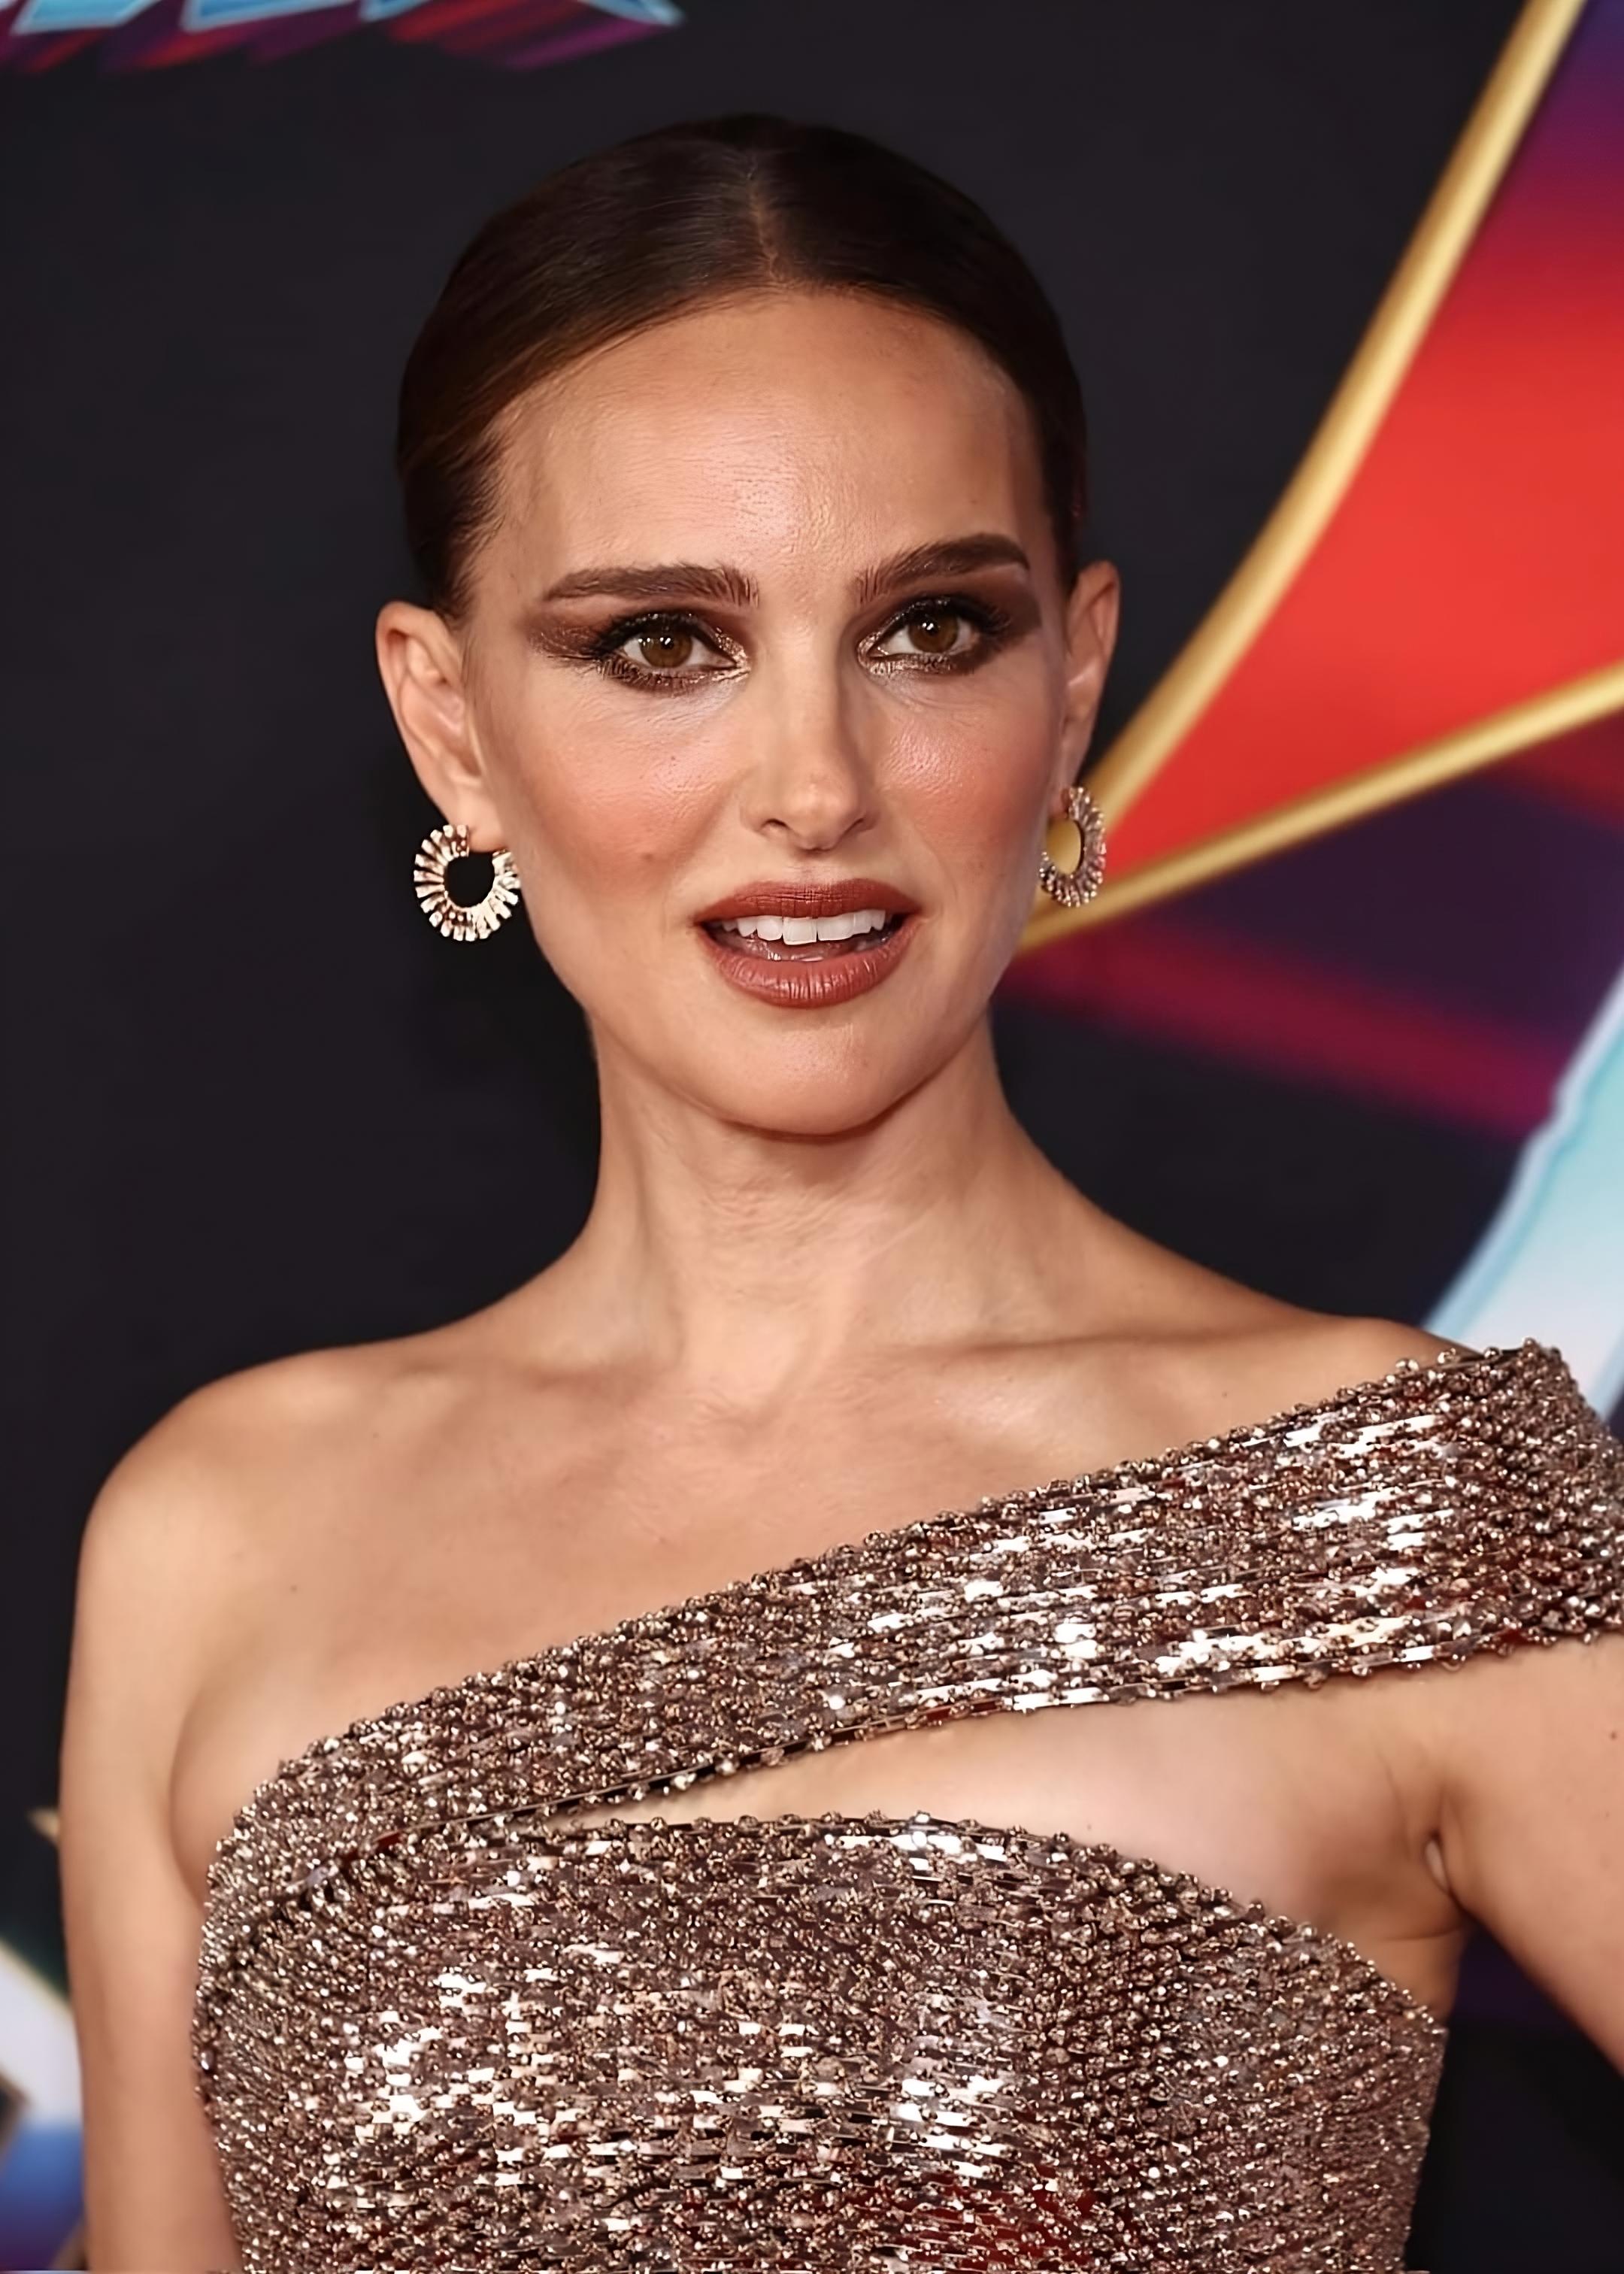 Natalie Portman Marvel Cinematic Universe Wiki Fandom